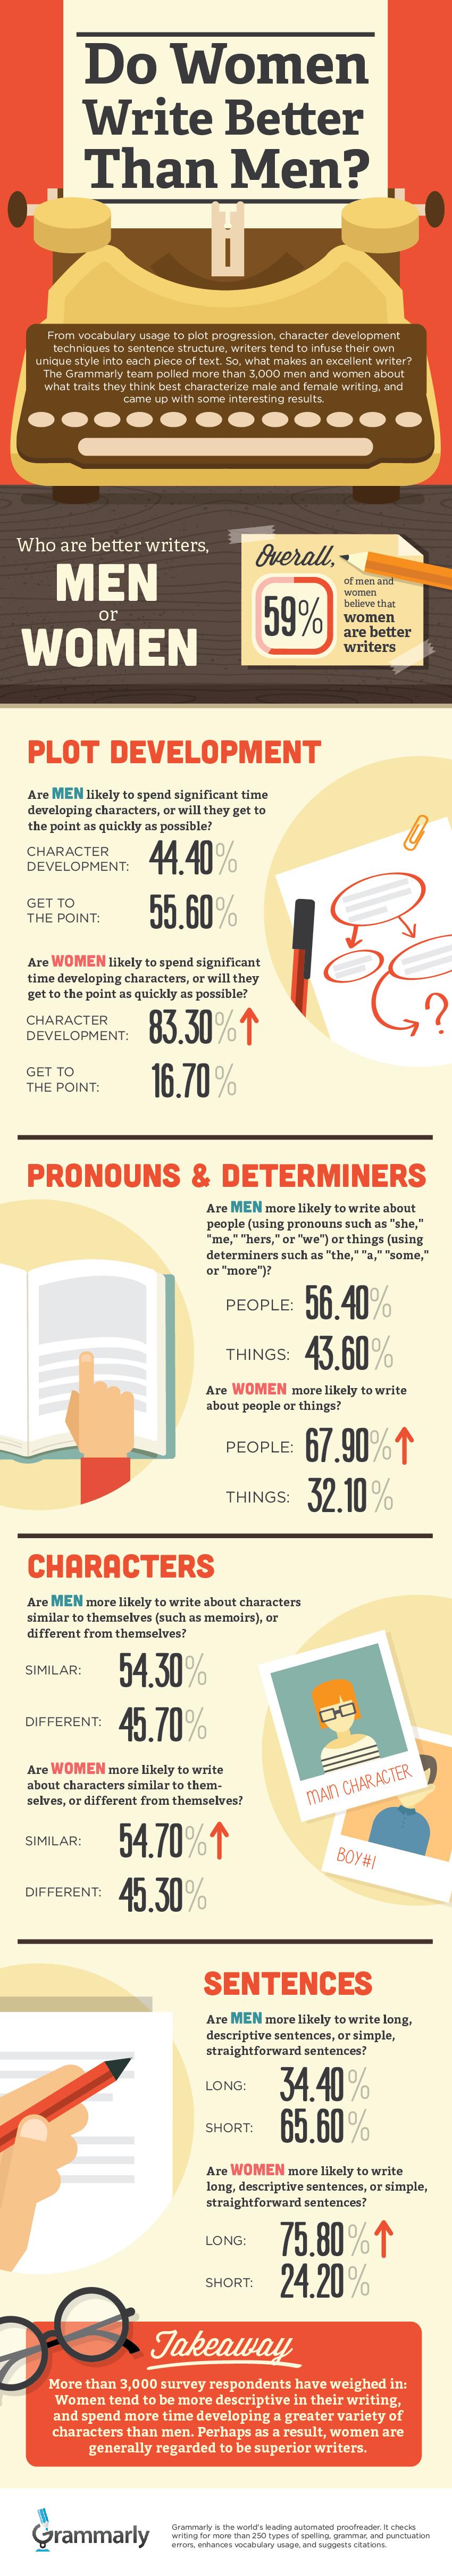 MenvsWomen_Writers_infographic